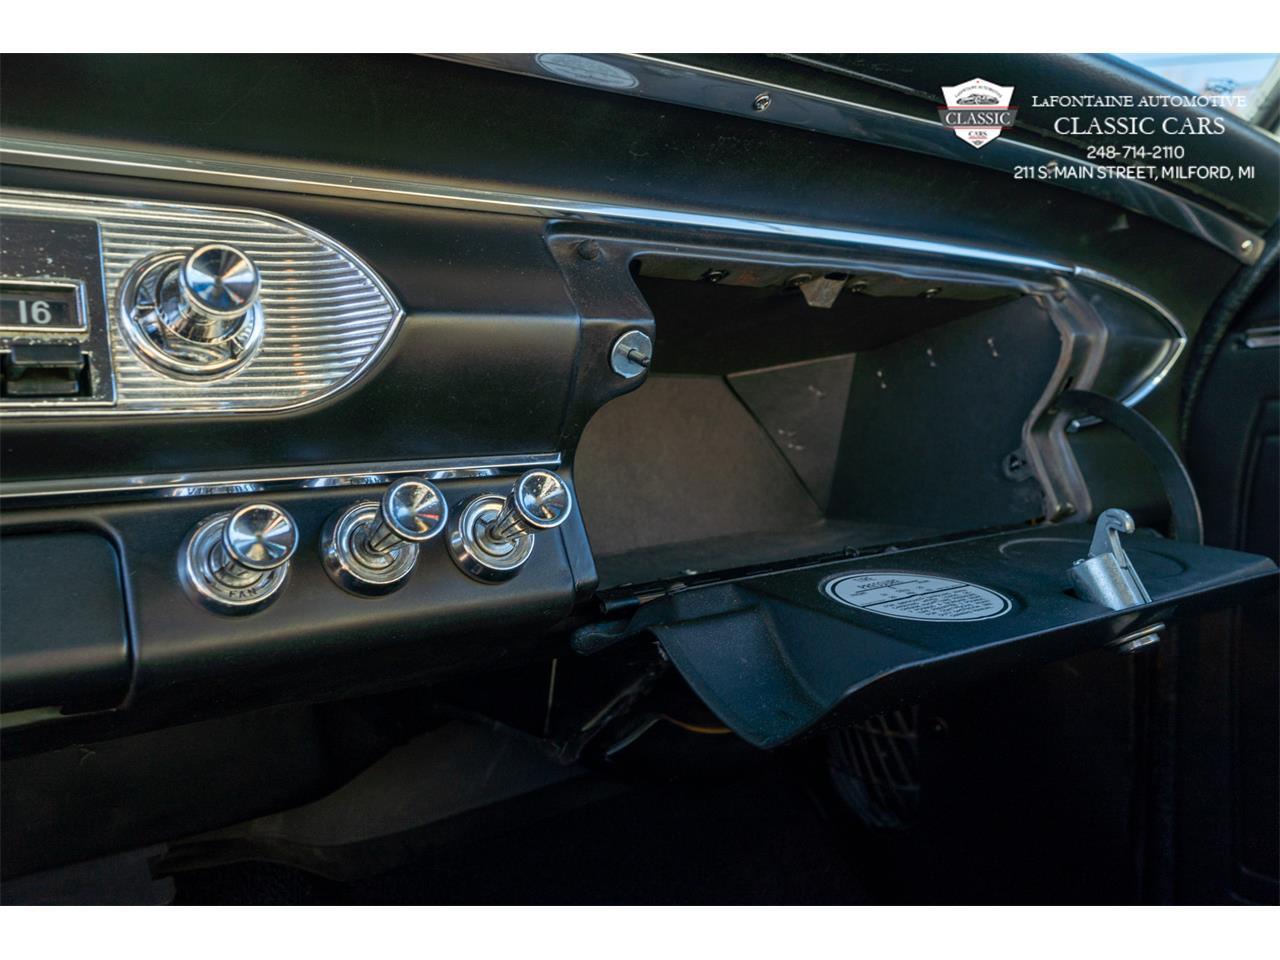 1964 Chevrolet Nova SS (CC-1420628) for sale in Milford, Michigan